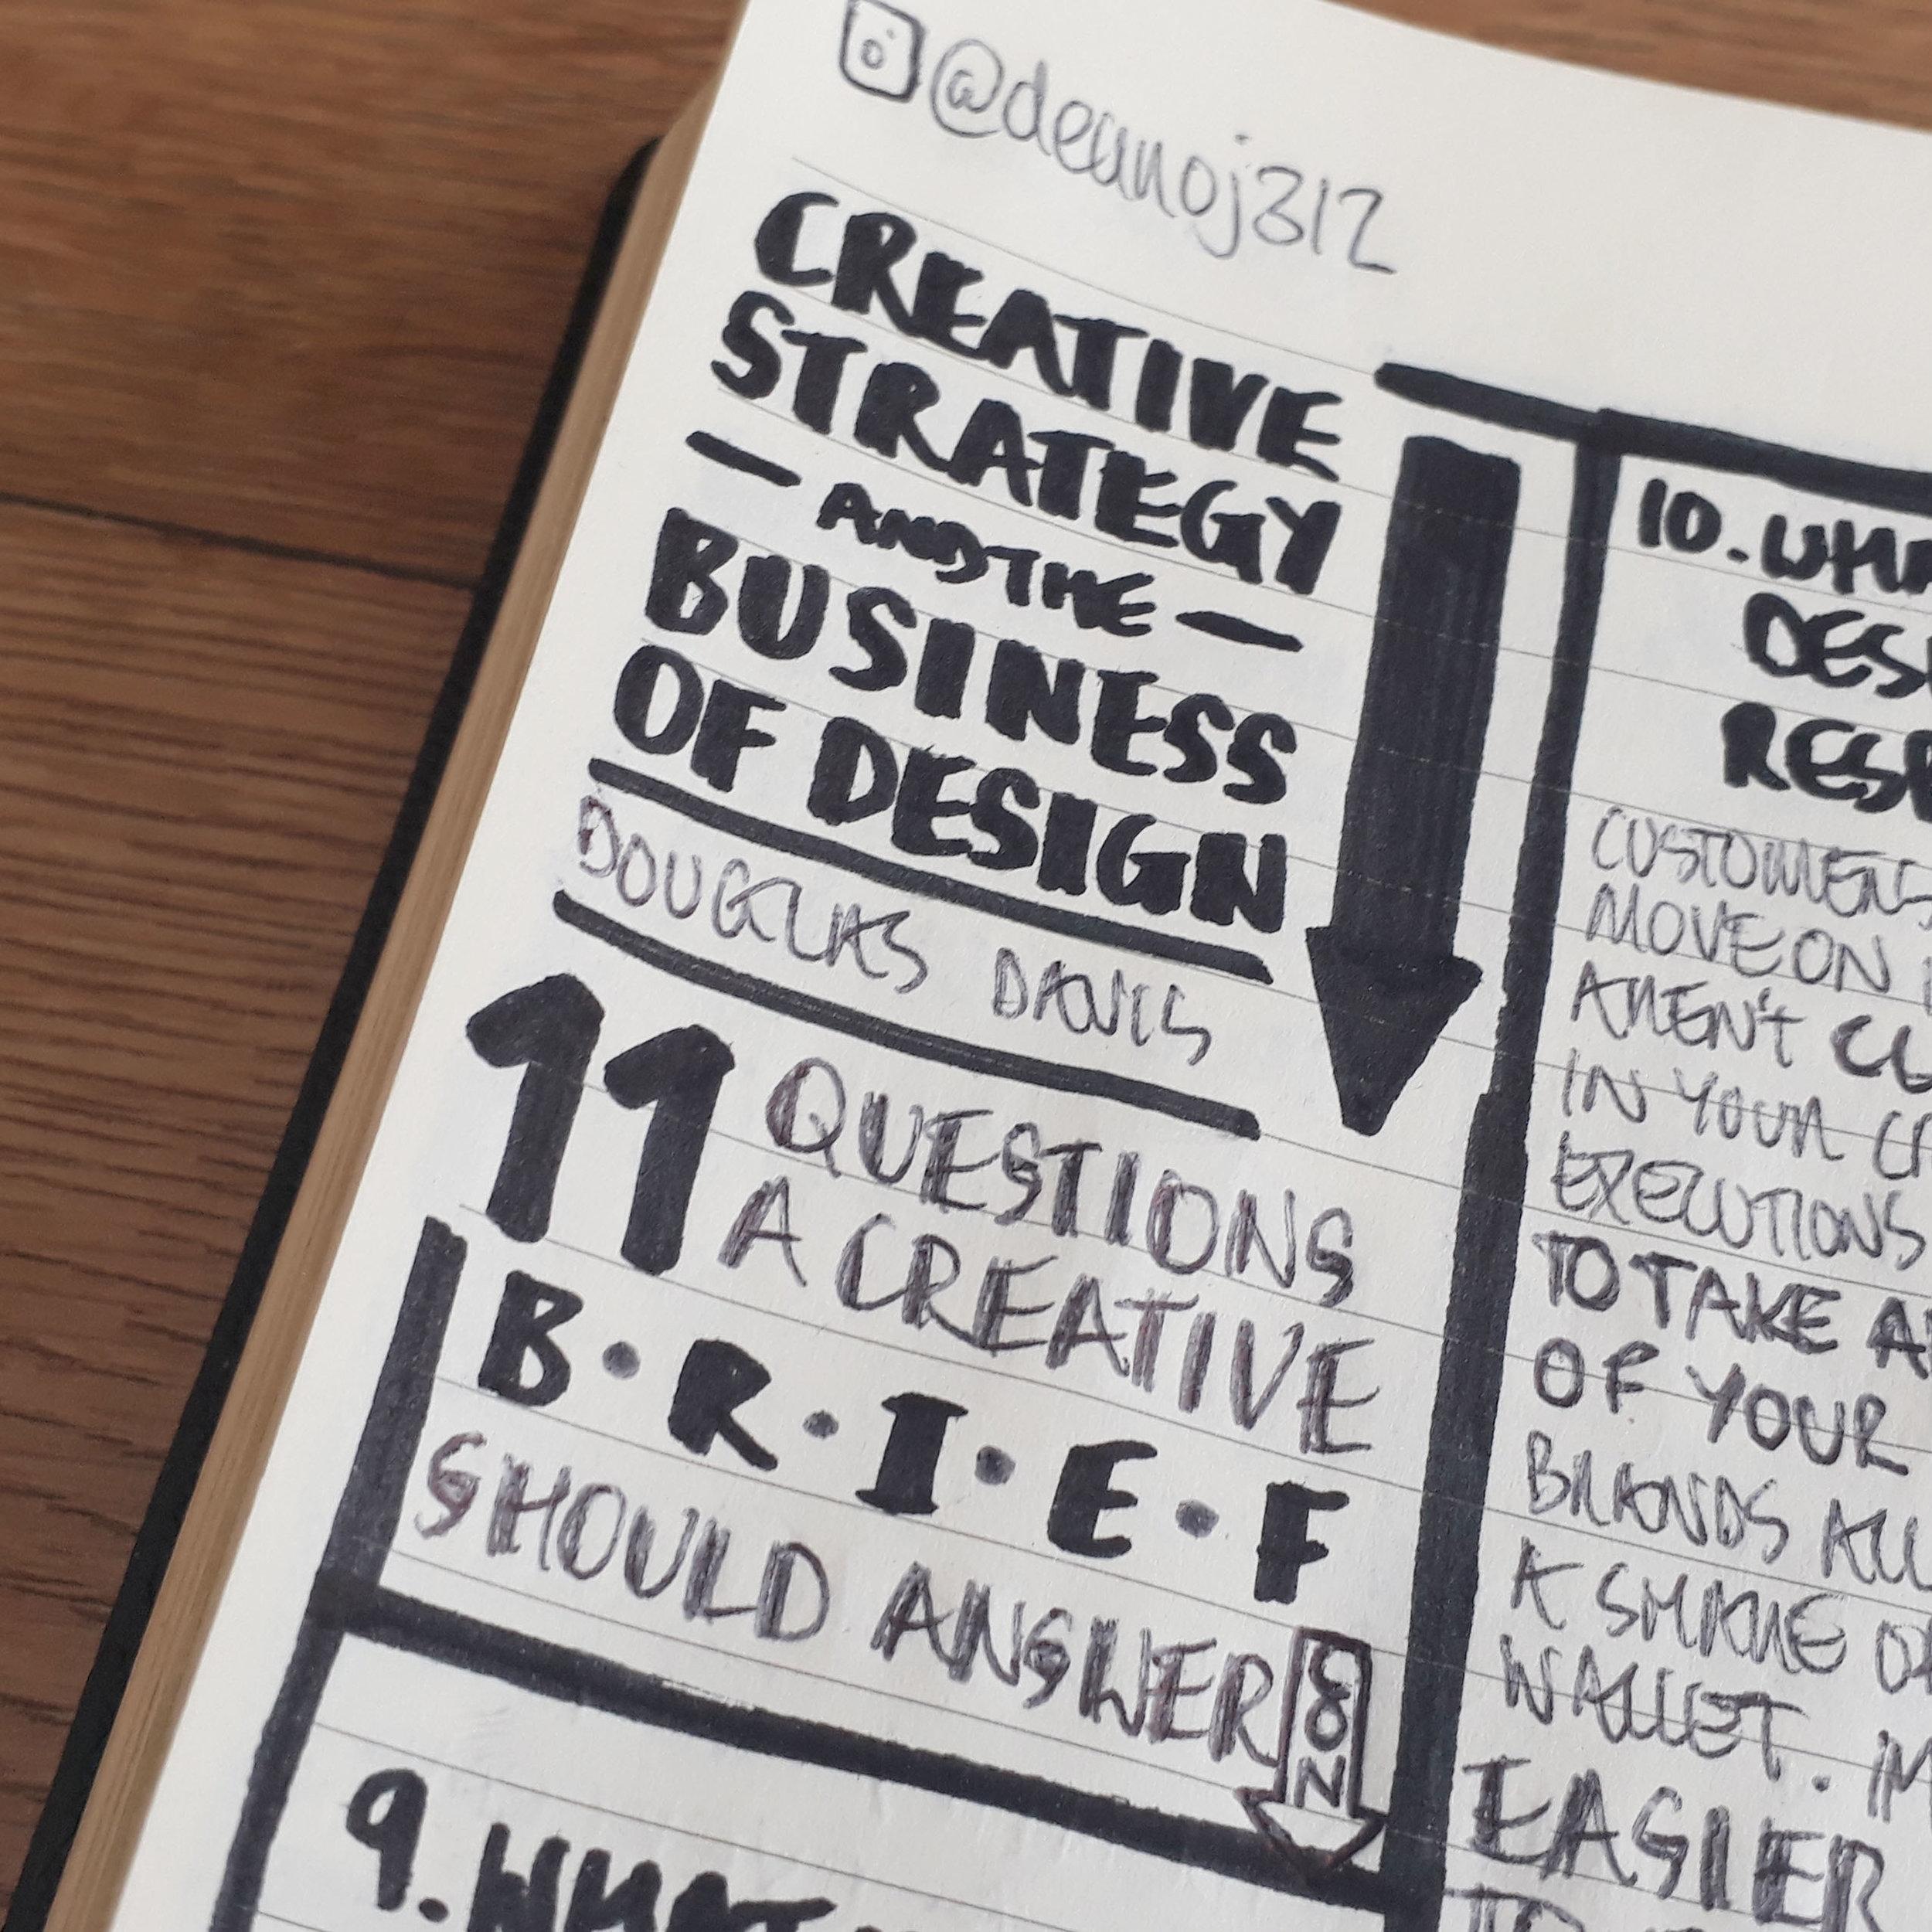 CreativeStrategyAndTheBusinessOfDesign_Part17.2.jpg